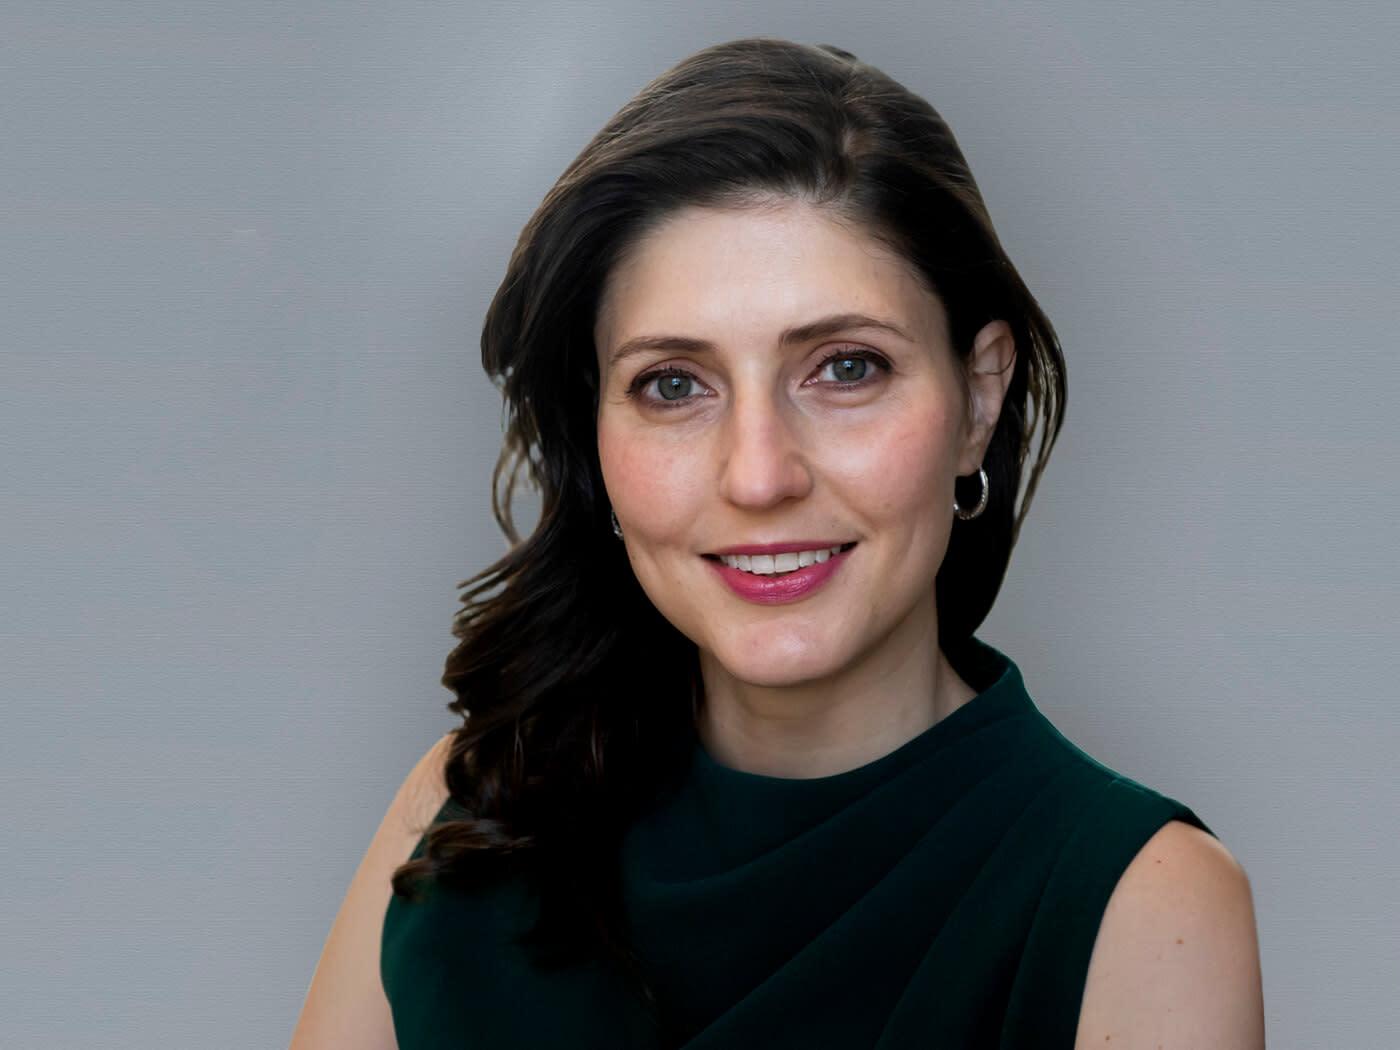 A headshot of the SEO of Marketing, Michele Morelli